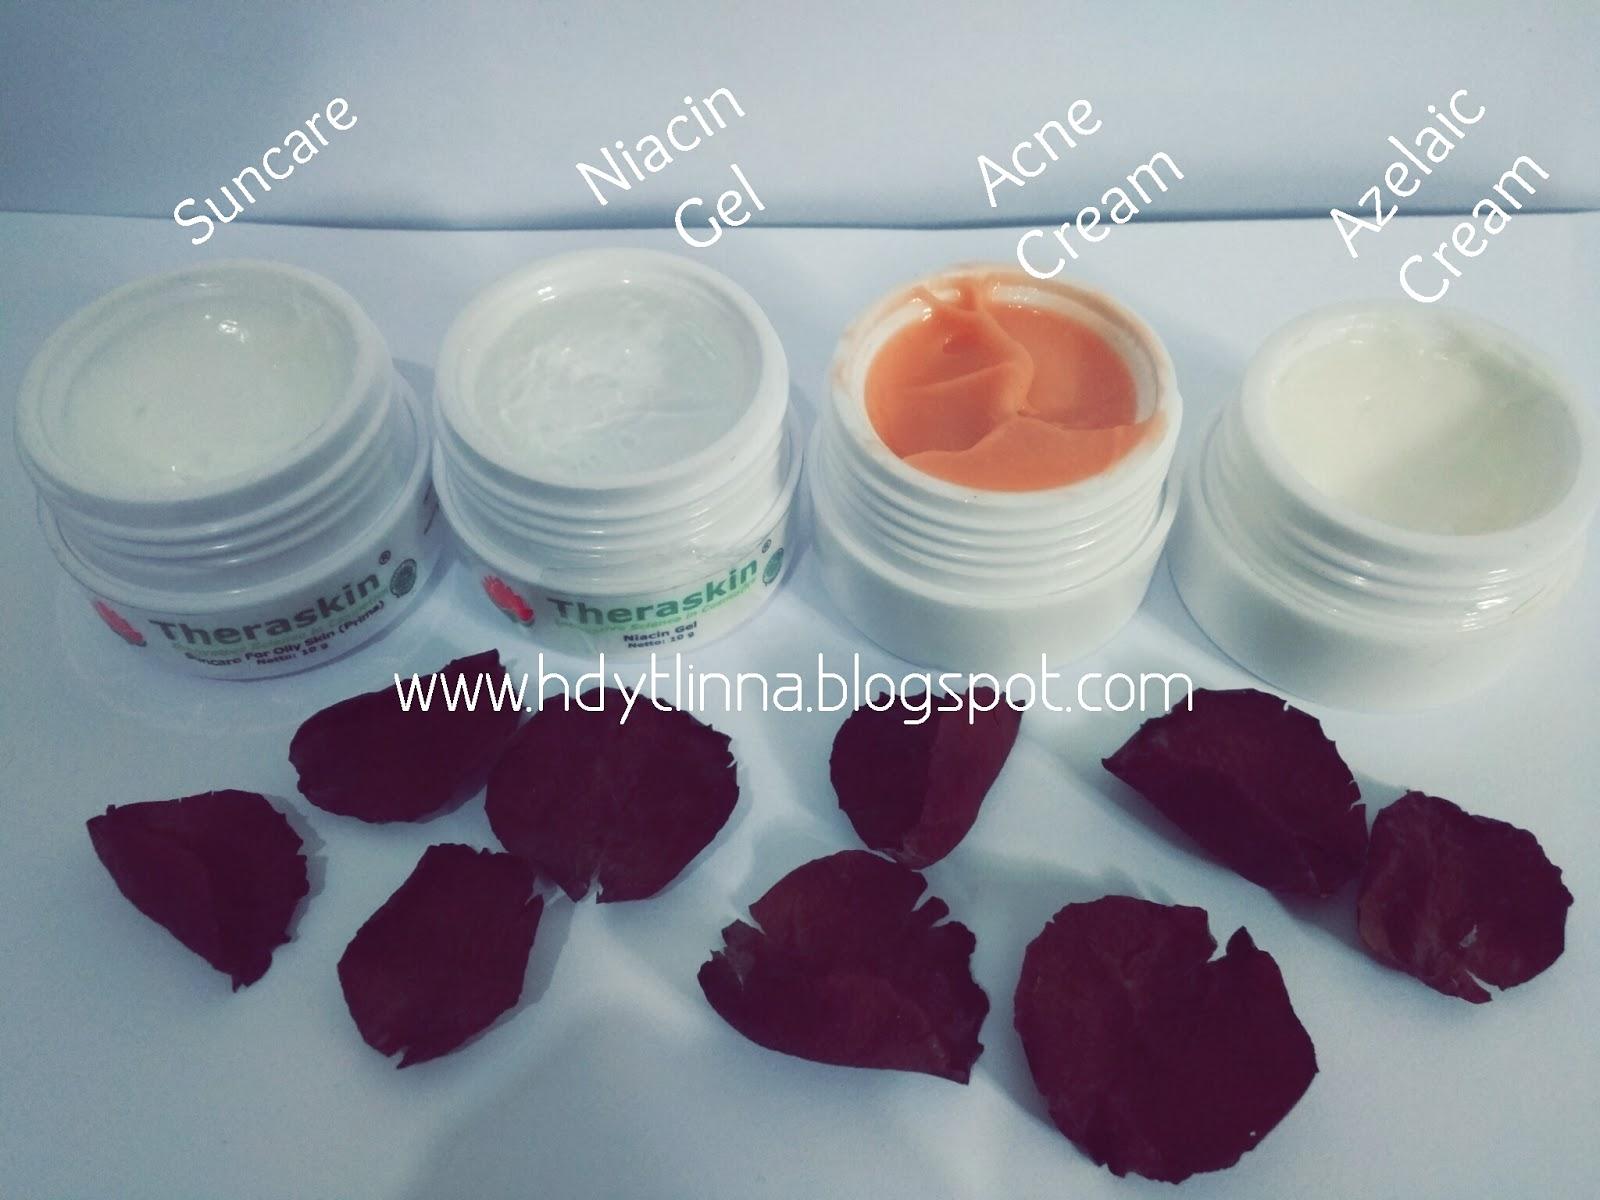 Review Theraskin Bye Acne Marlina Hidayati Powder Dokter Menjelaskan Cream Non Label Azelaic Acid 10 Niacinamide 4 Di Pakai Gantian Dengan Pada Malam Hari Kalau Pagi Niacin Gel